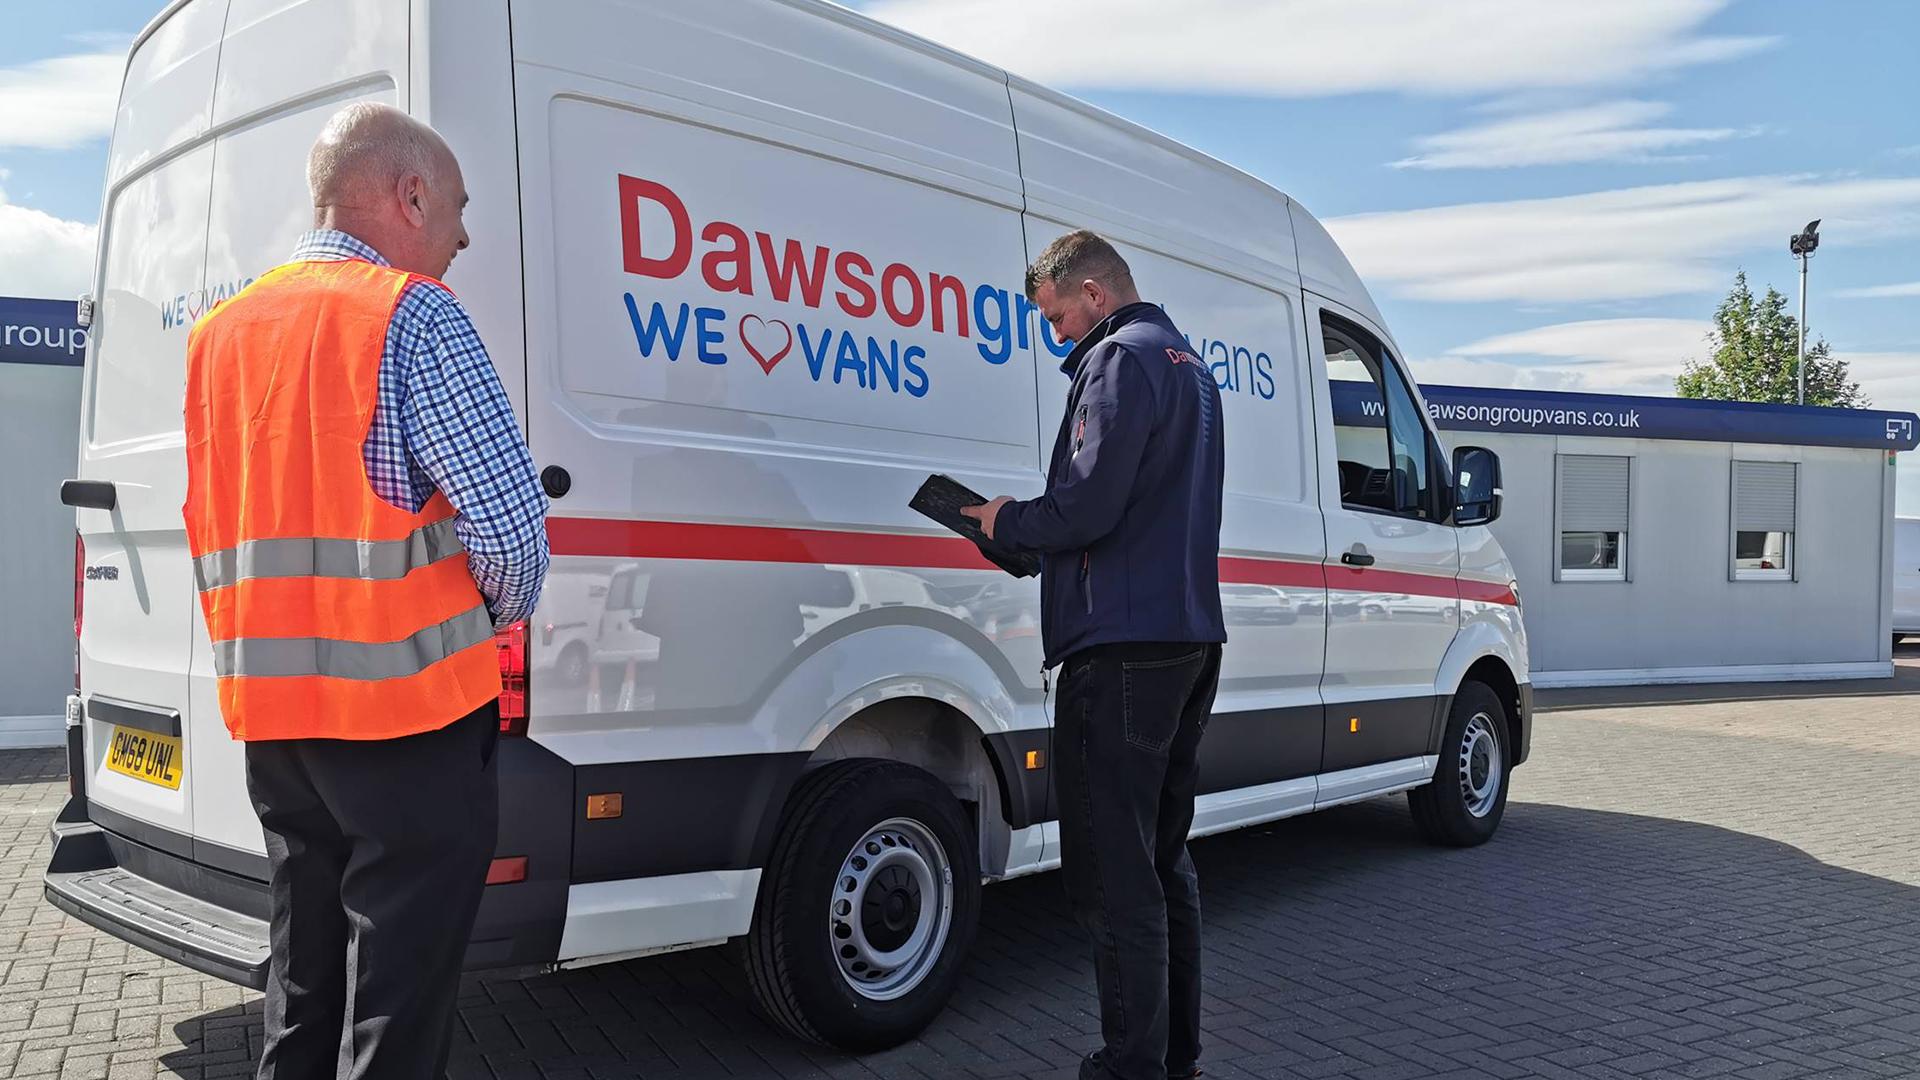 Business Van Leasing | Dawsongroup Finance